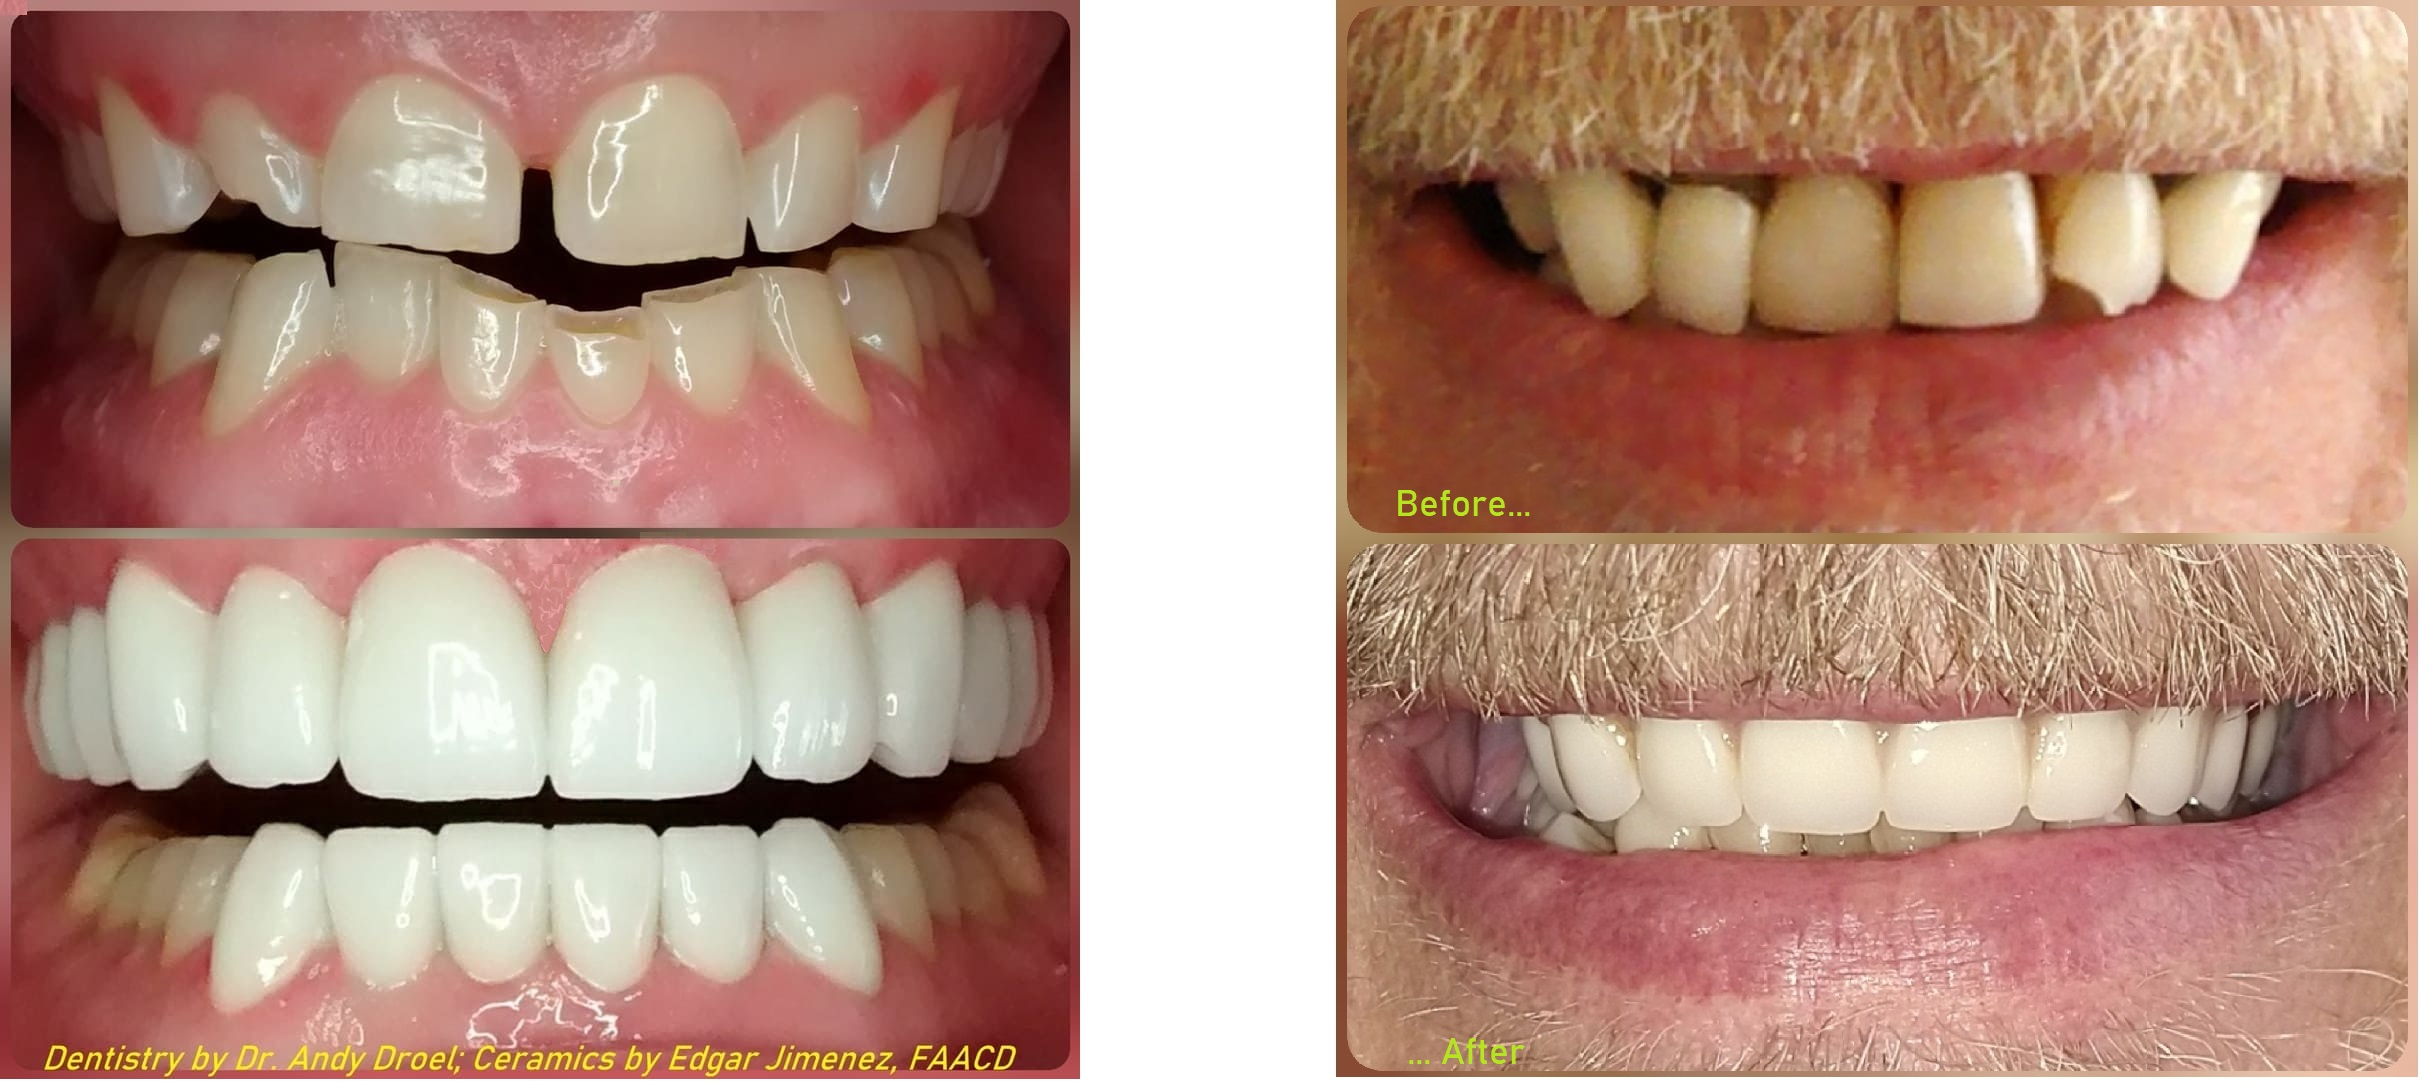 major dental overhaul reconstruction